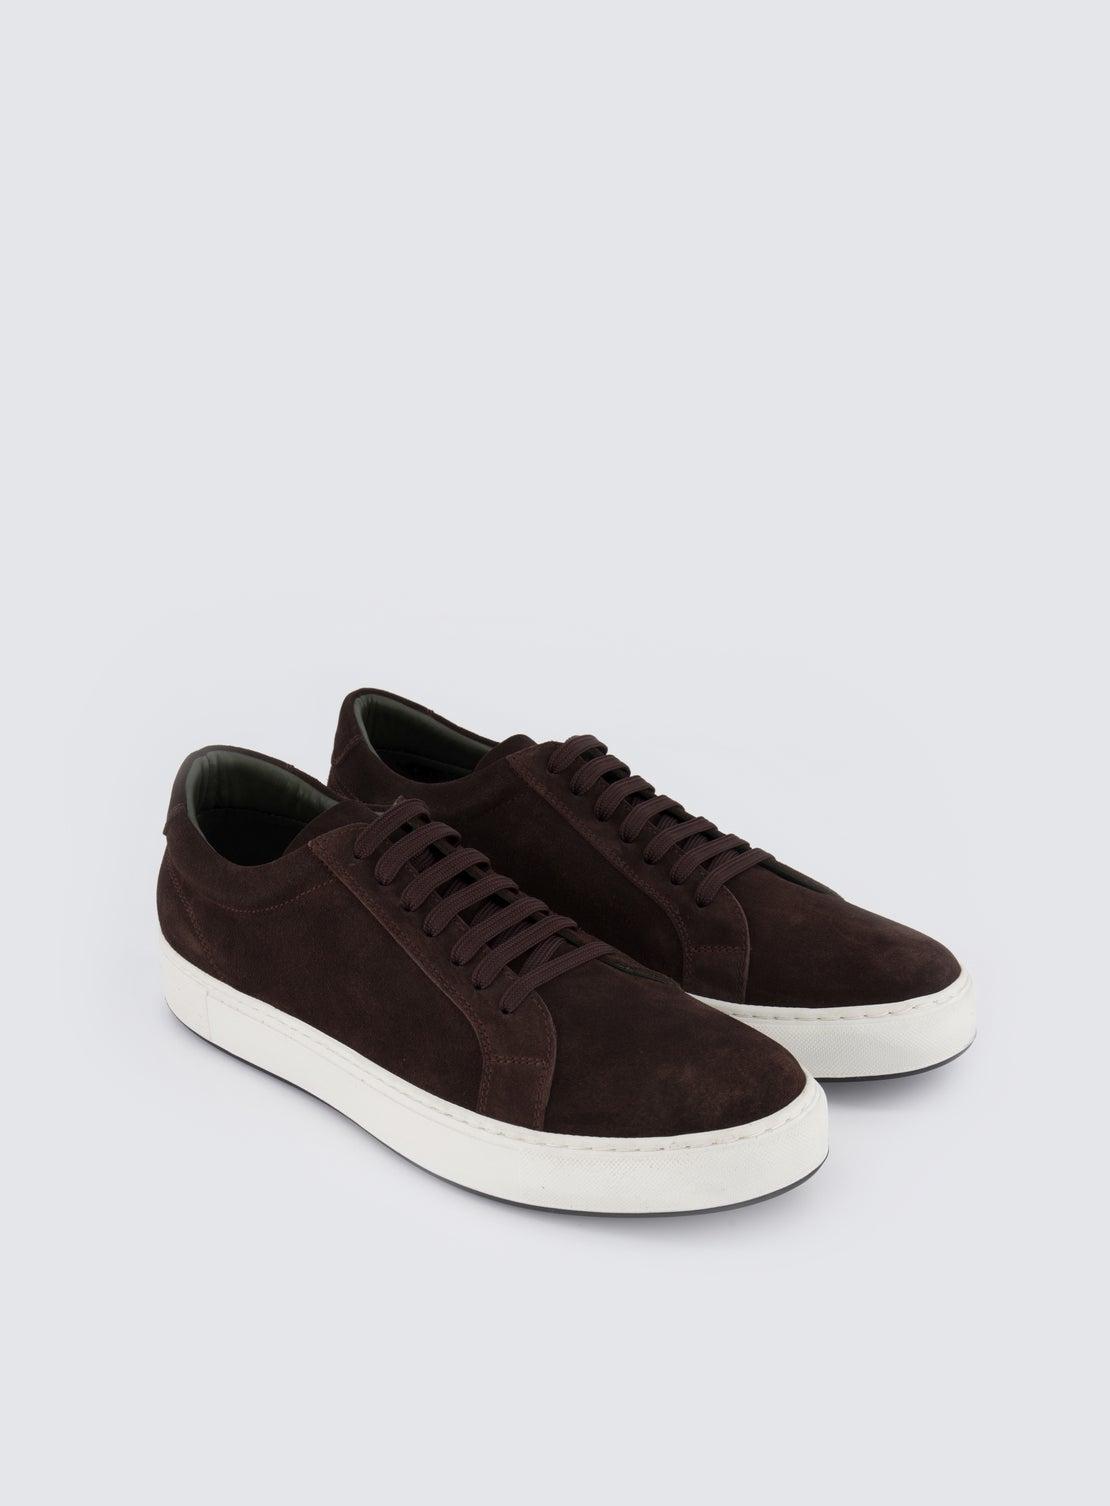 Coltrane Chocolate Suede Sneaker